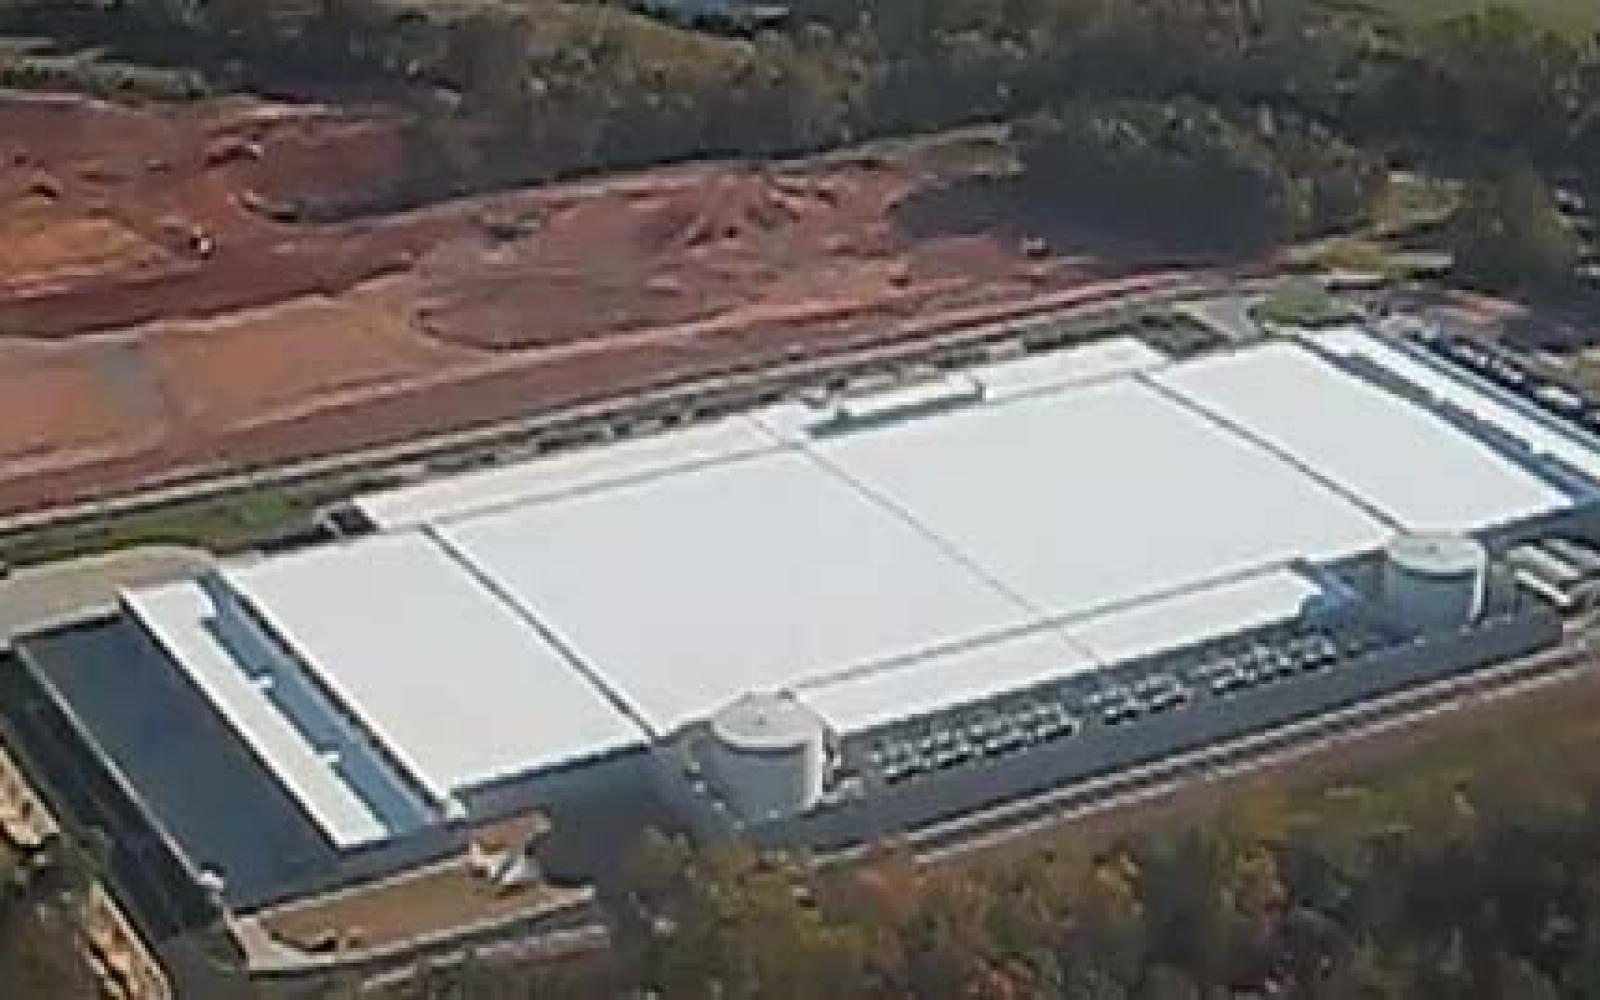 Chlorine leak causes multiple injuries at Apple's North Carolina data center